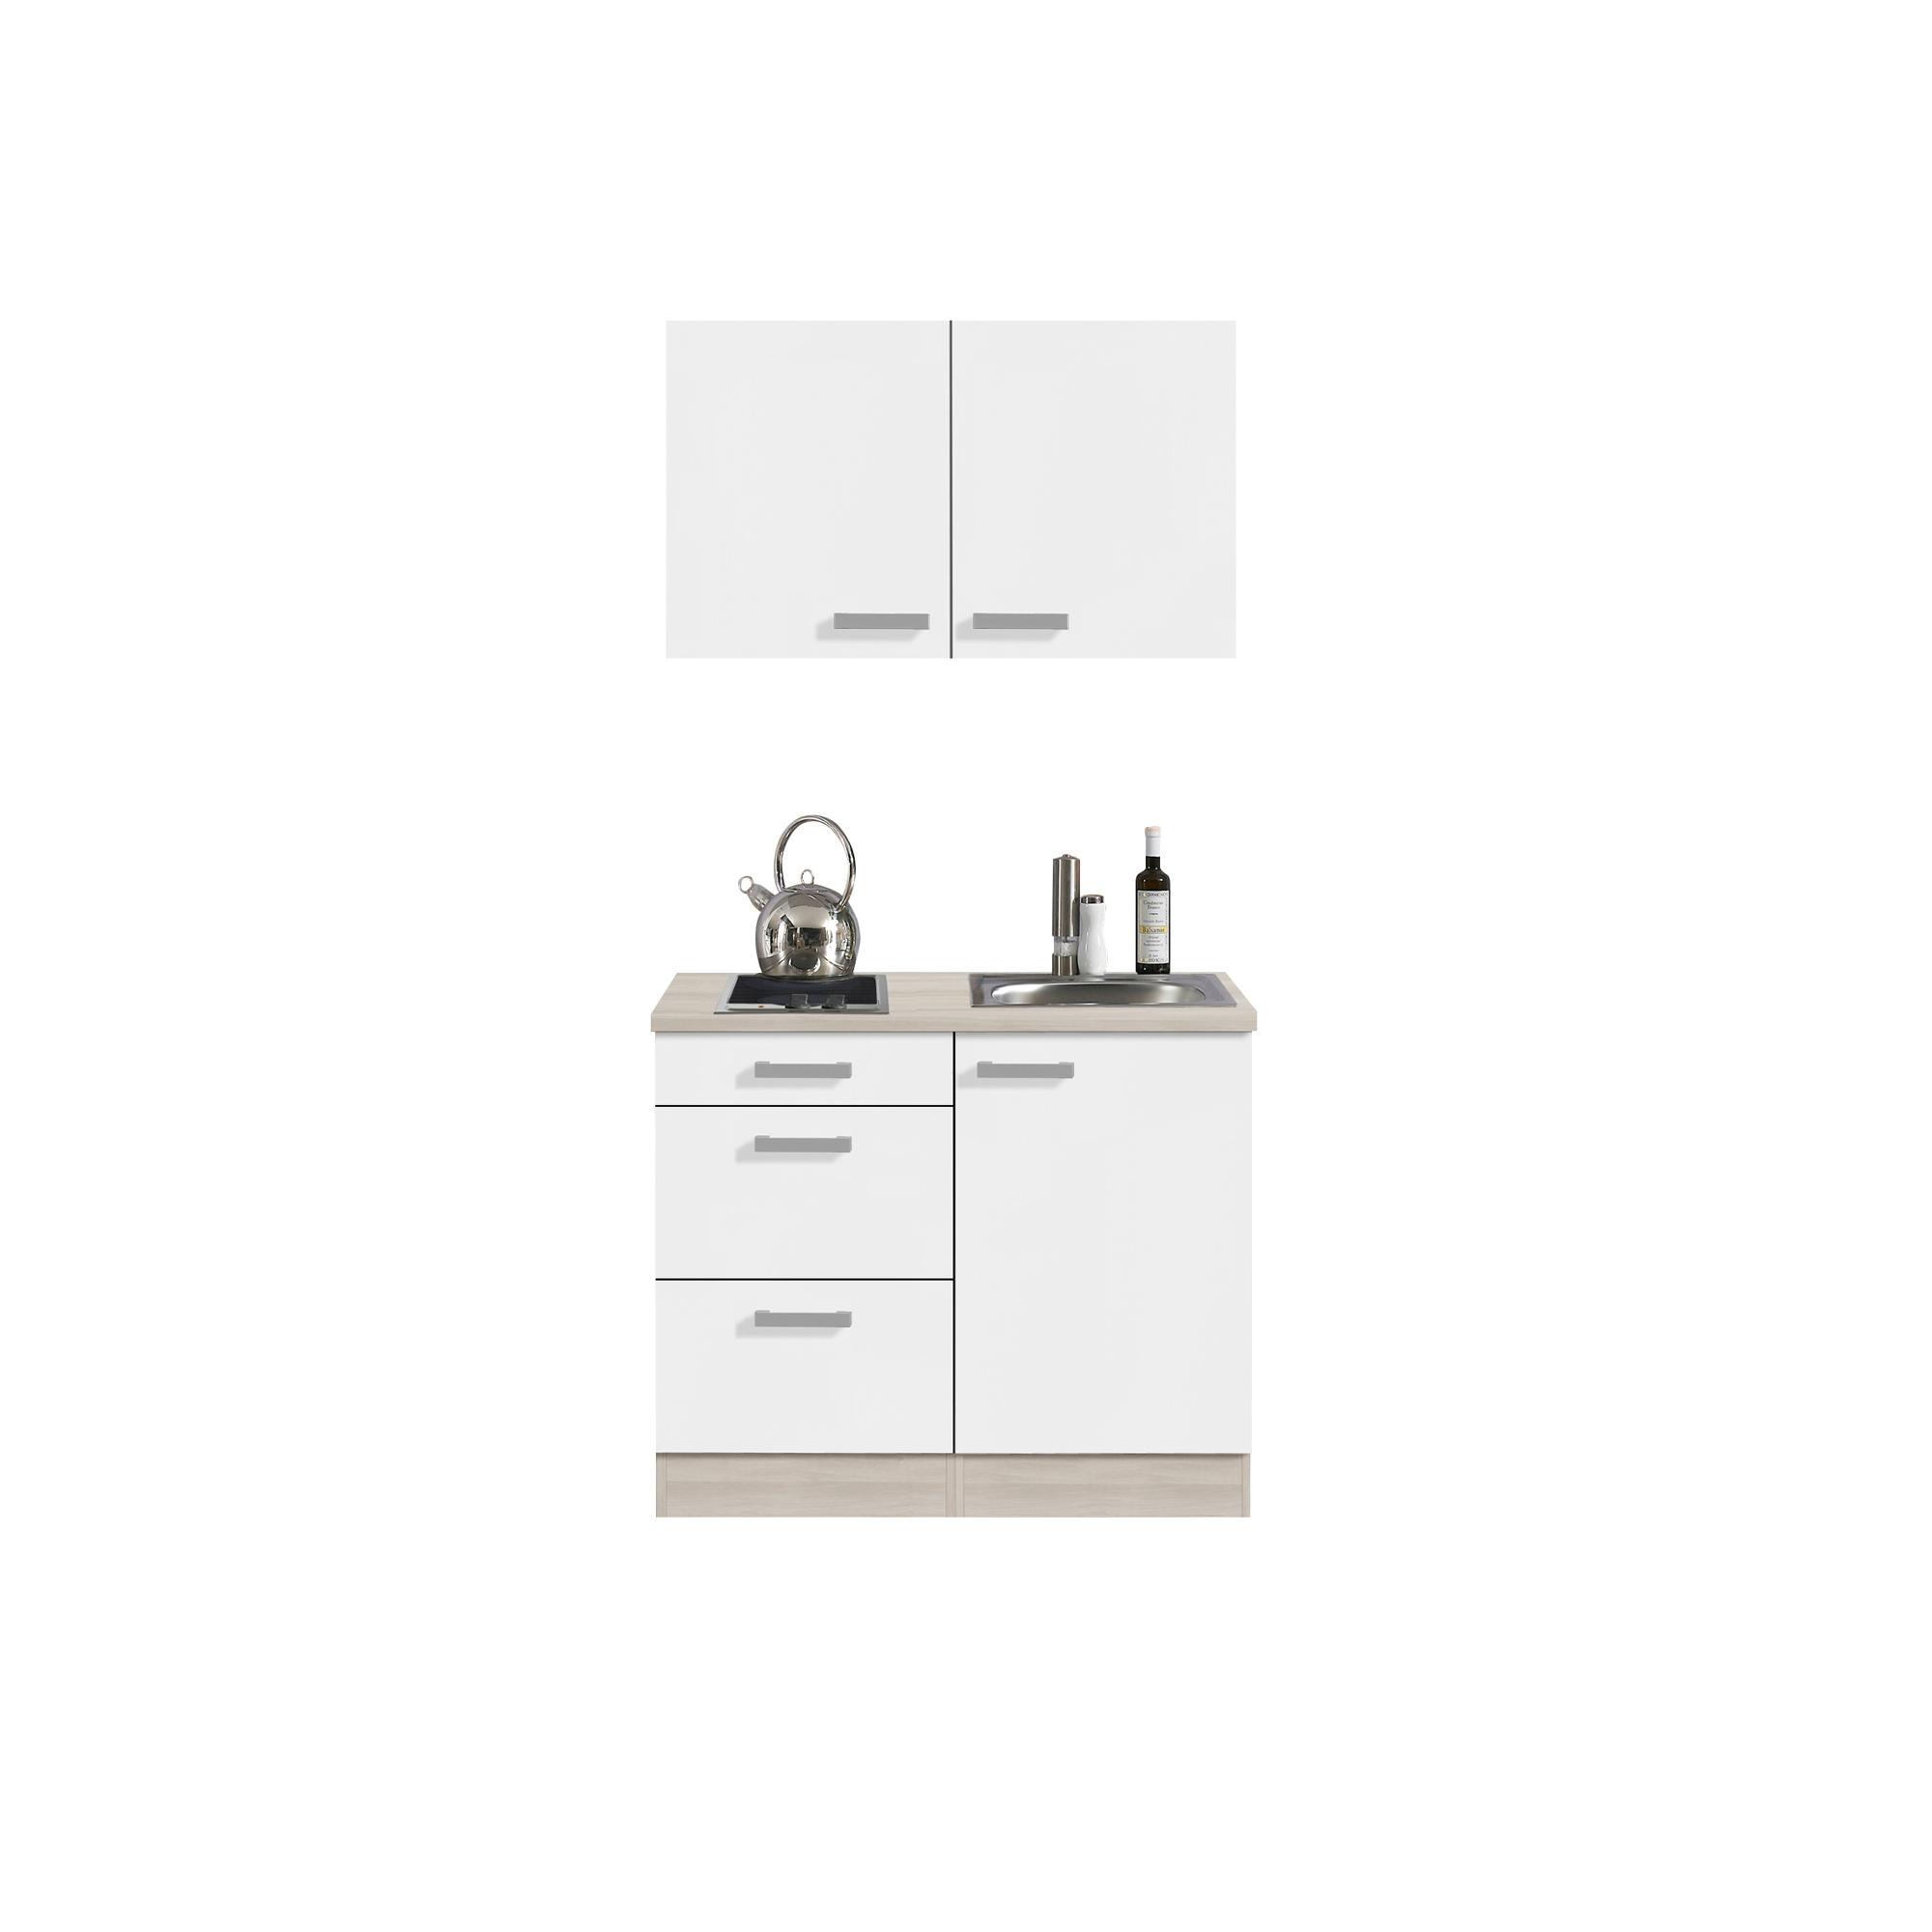 singlek che barcelona mit glaskeramik kochfeld breite 100 cm wei k che singlek chen. Black Bedroom Furniture Sets. Home Design Ideas